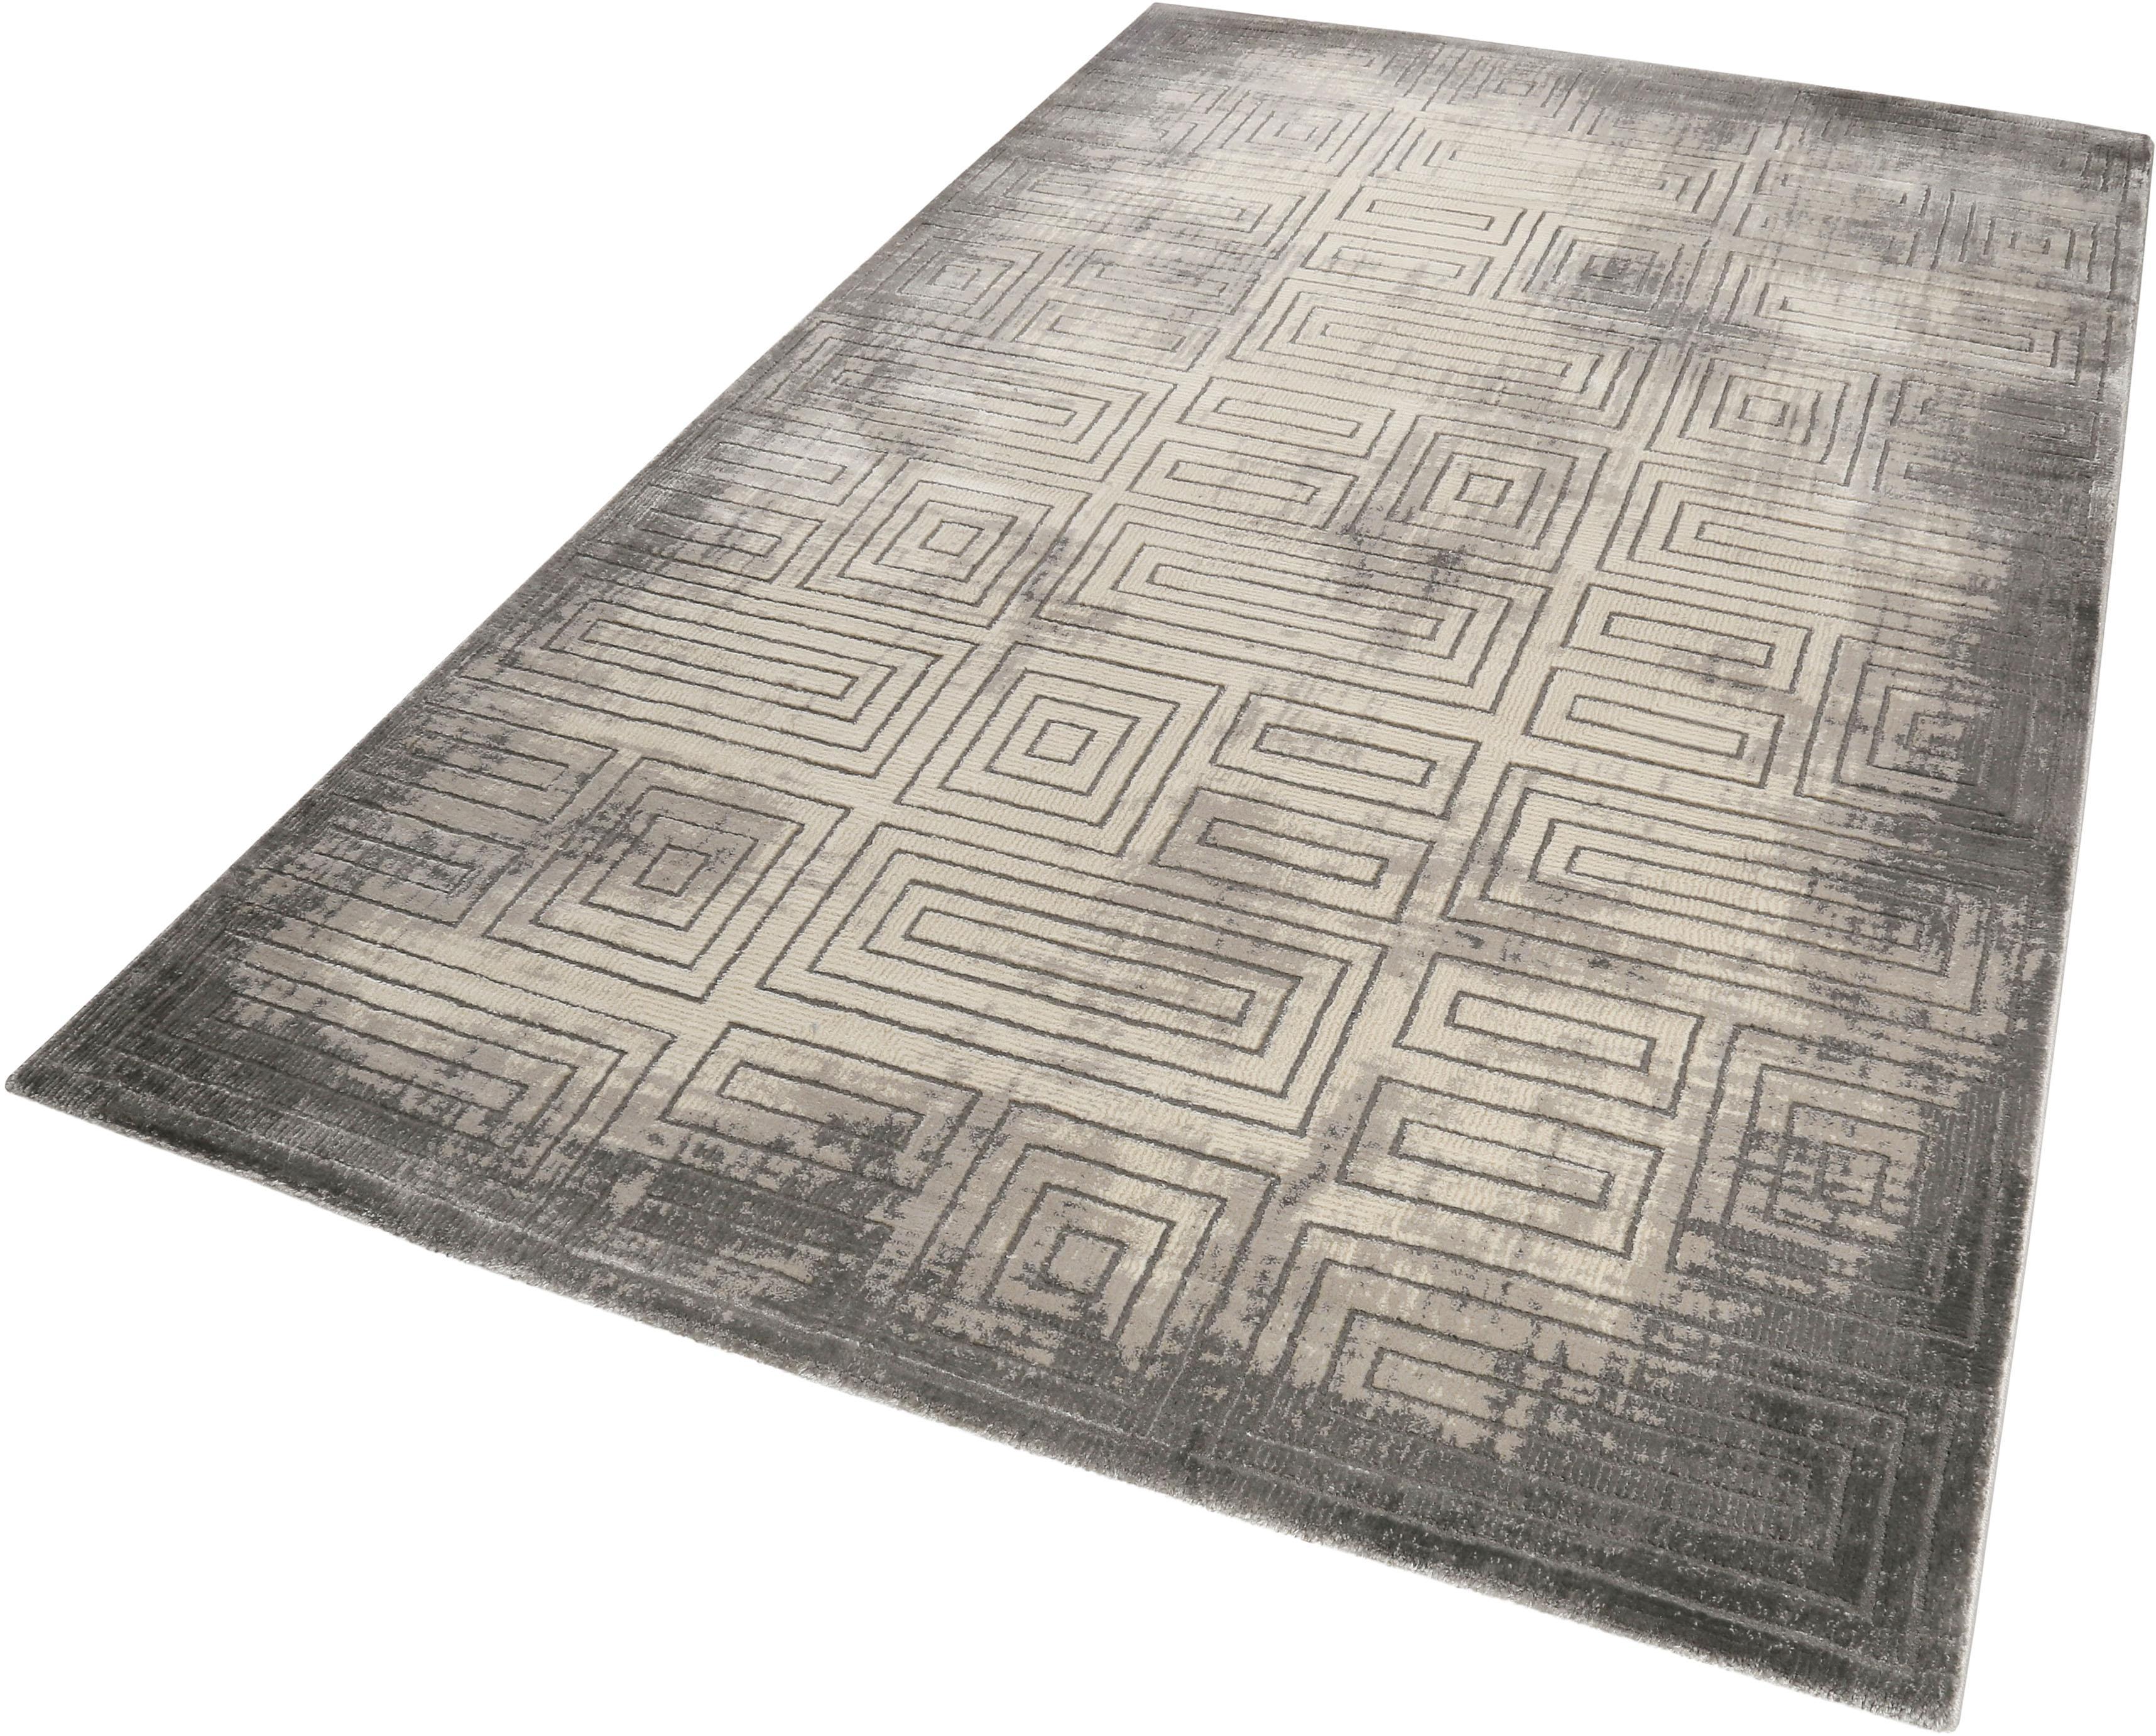 Teppich Aiden Esprit rechteckig Höhe 12 mm maschinell gewebt